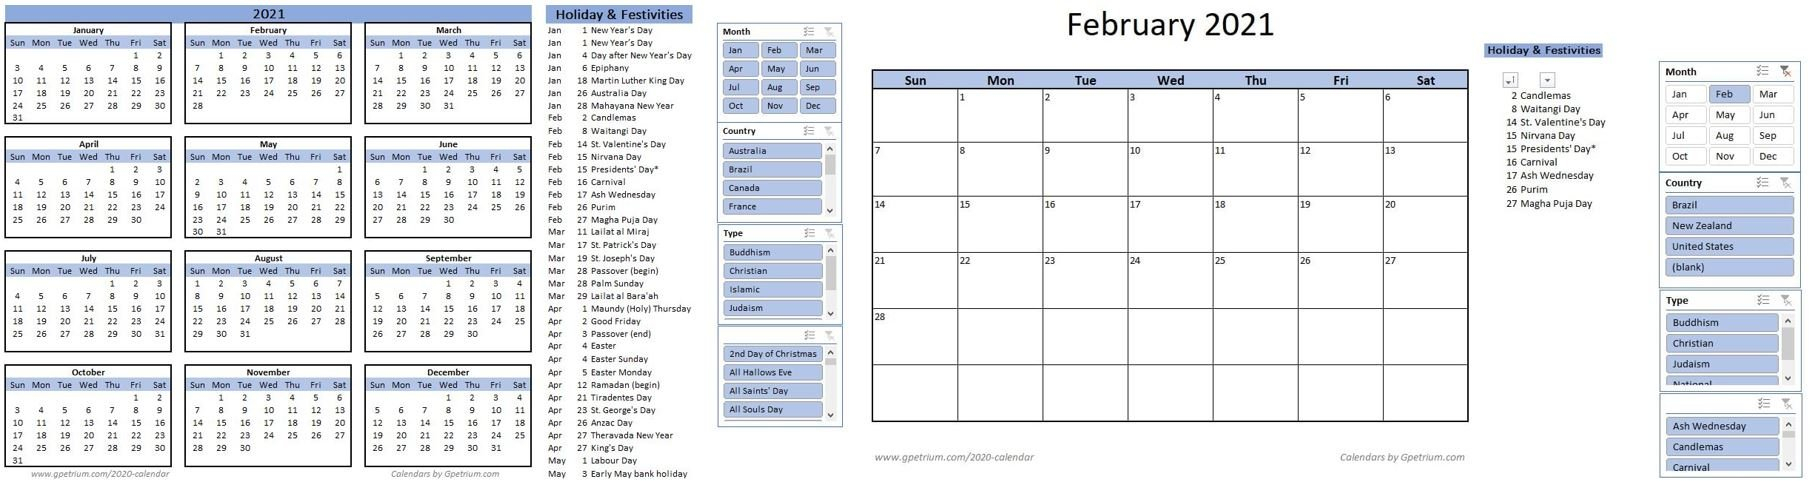 Free 2021 Calendar Template In Excel – Gpetrium regarding Hunting Season: Calendar 2021 Monthly